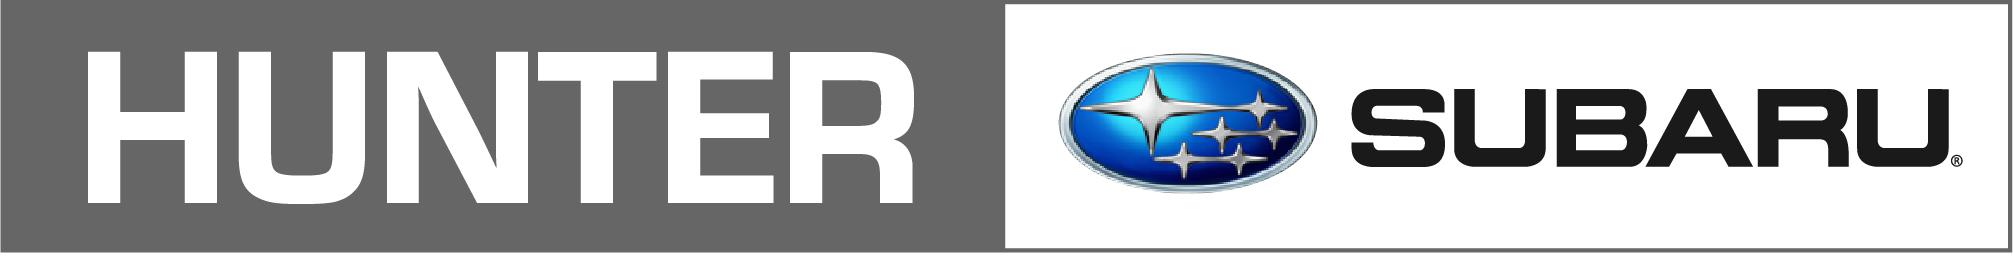 Hunter Subaru Logo